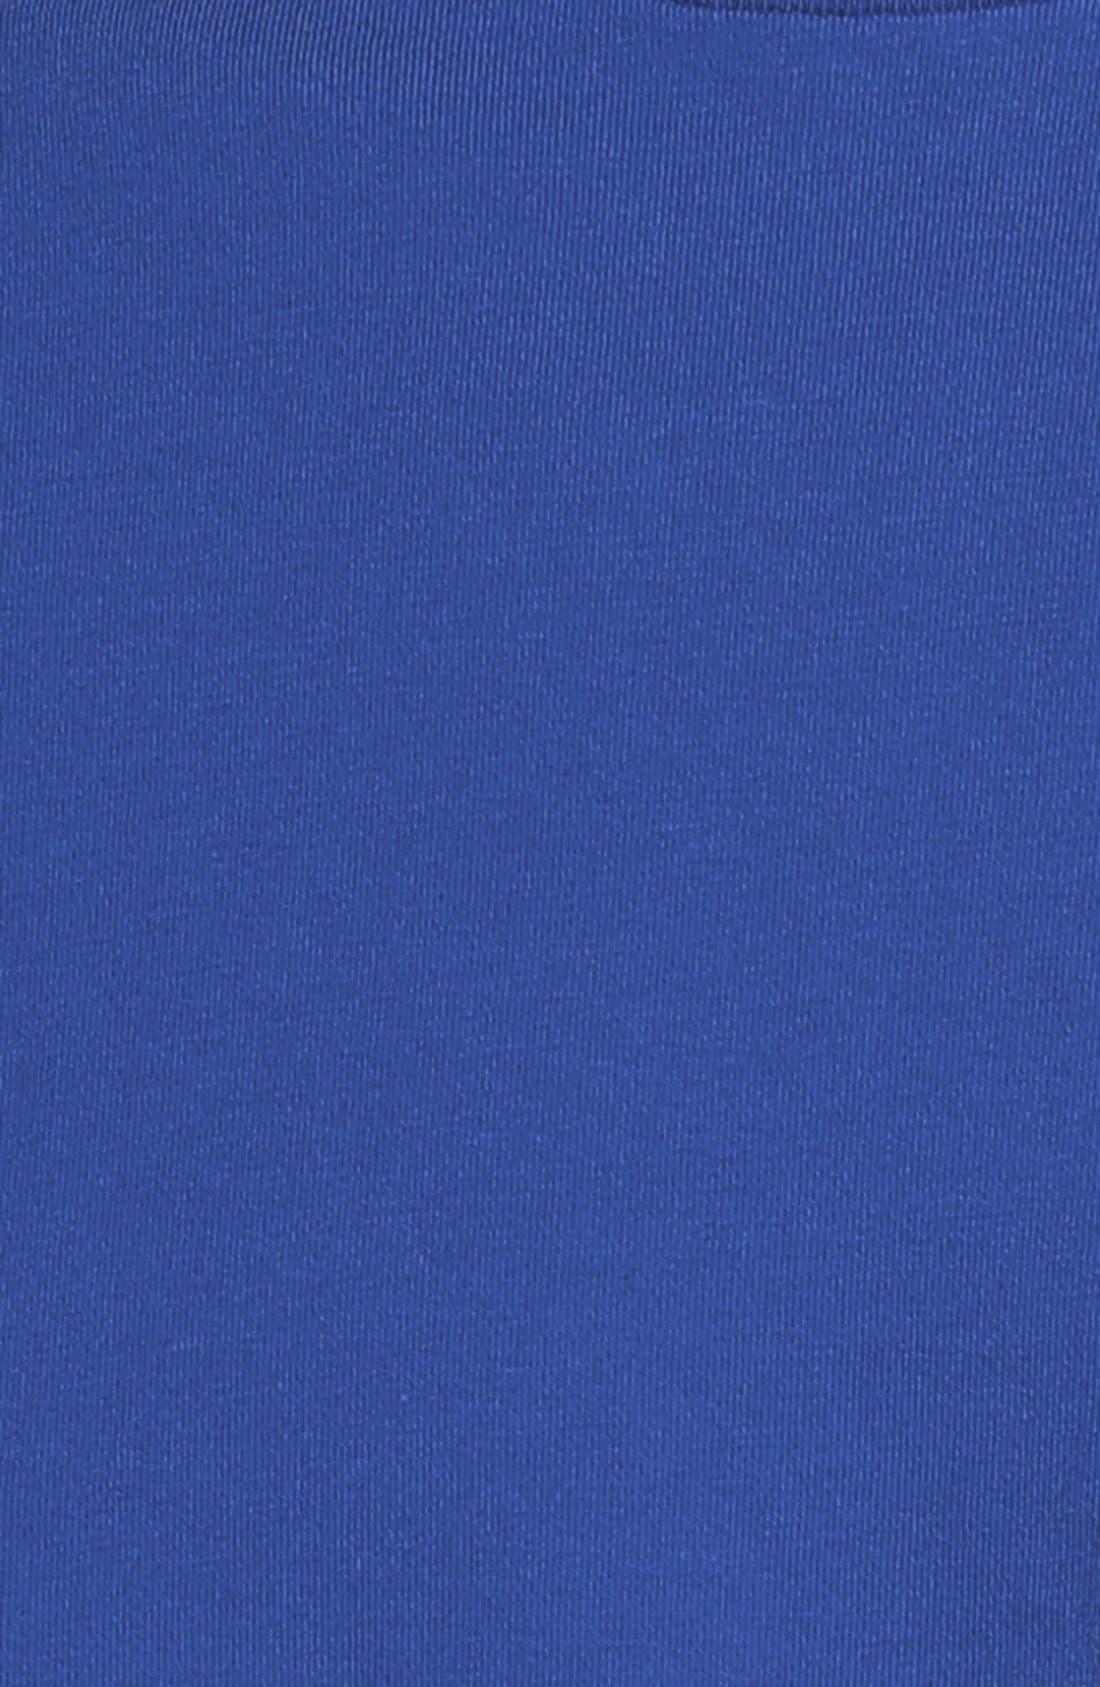 Alternate Image 3  - Vineyard Vines 'American Flag Whale' Graphic T-Shirt